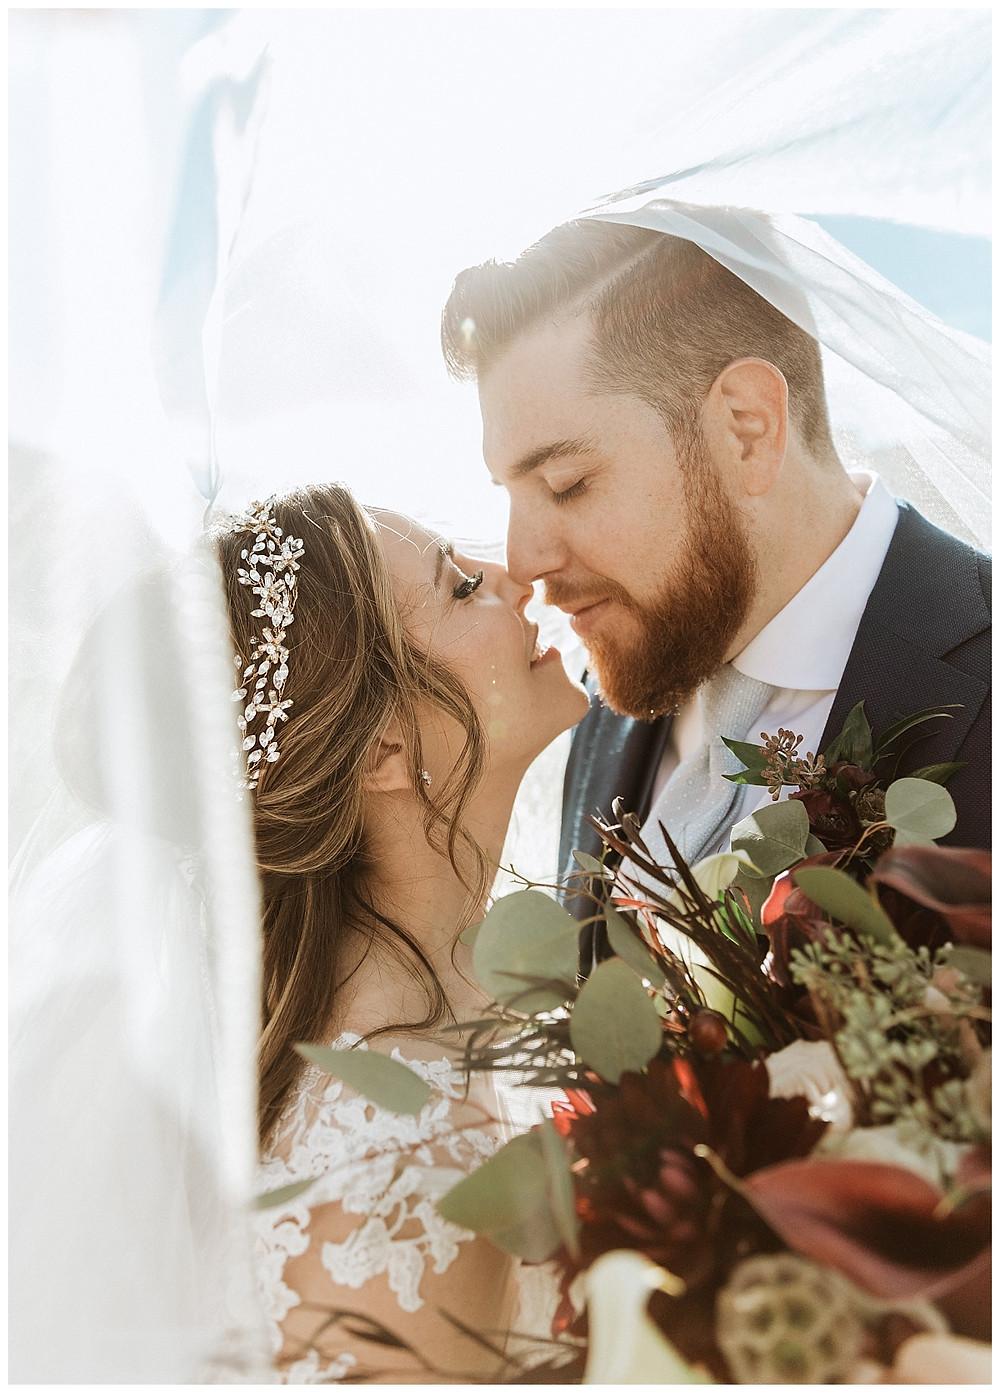 Romantic Bride and Groom Veil Shot Portraits